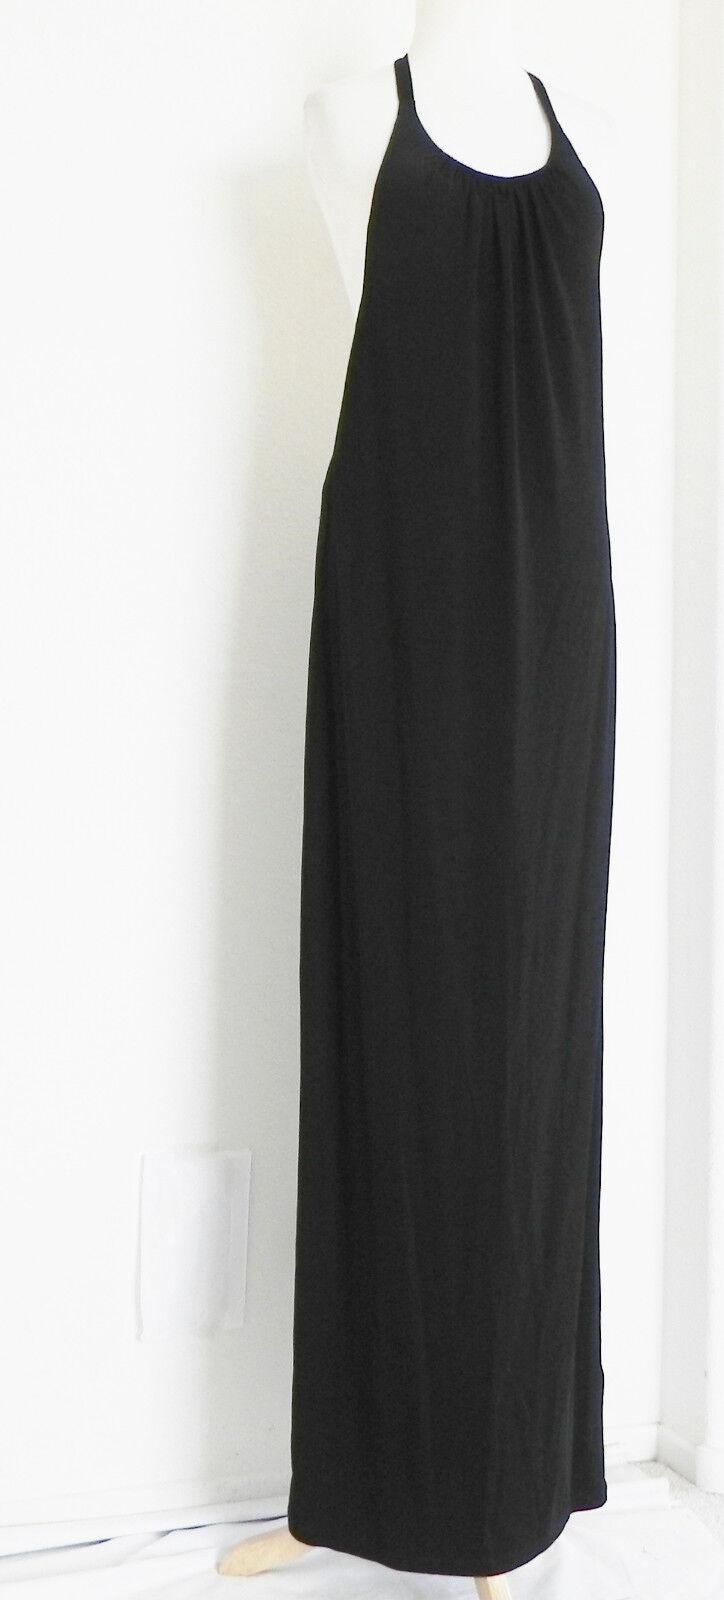 OVS Oviesse-Venezia Dress Halter Viscosa Größe M Sleeveless Full Length